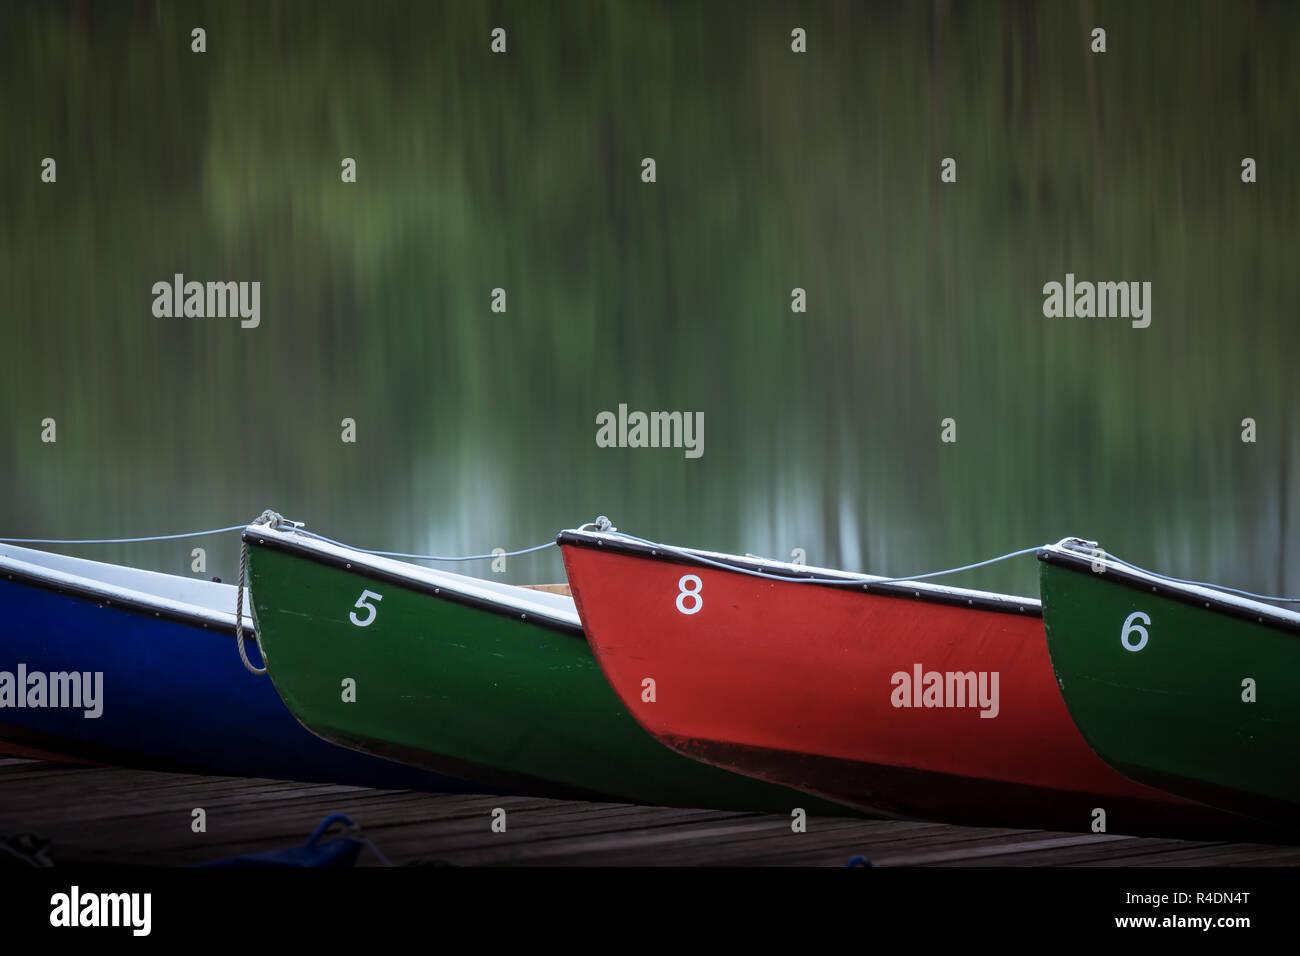 Ruderboote auf Steg am Maschsee in Hannover Stock Photo